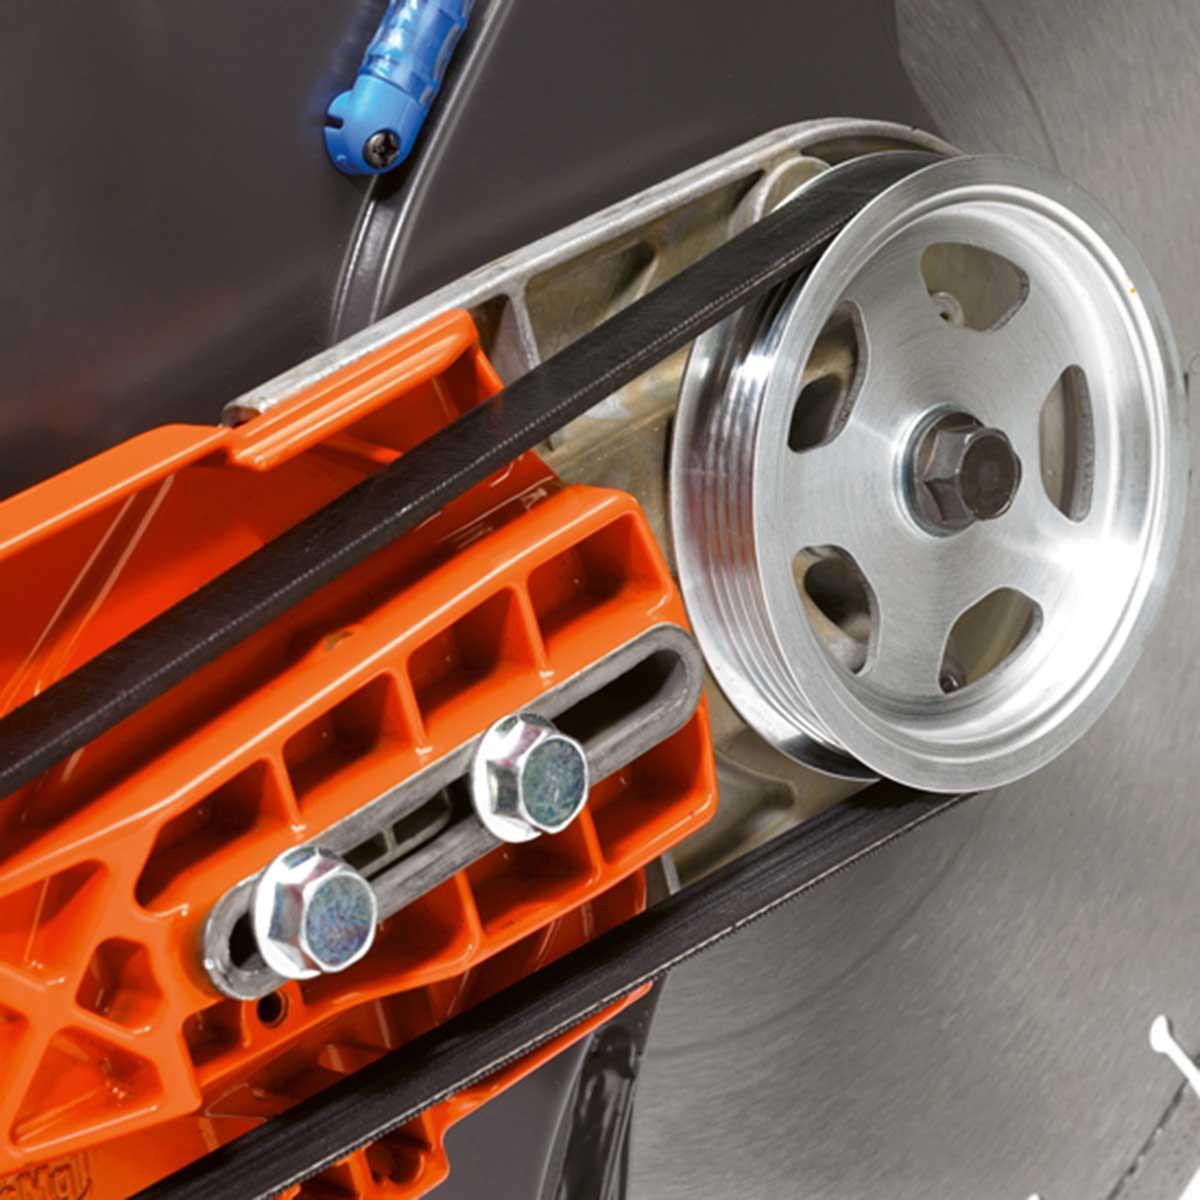 Husqvarna K970 saw belt drive